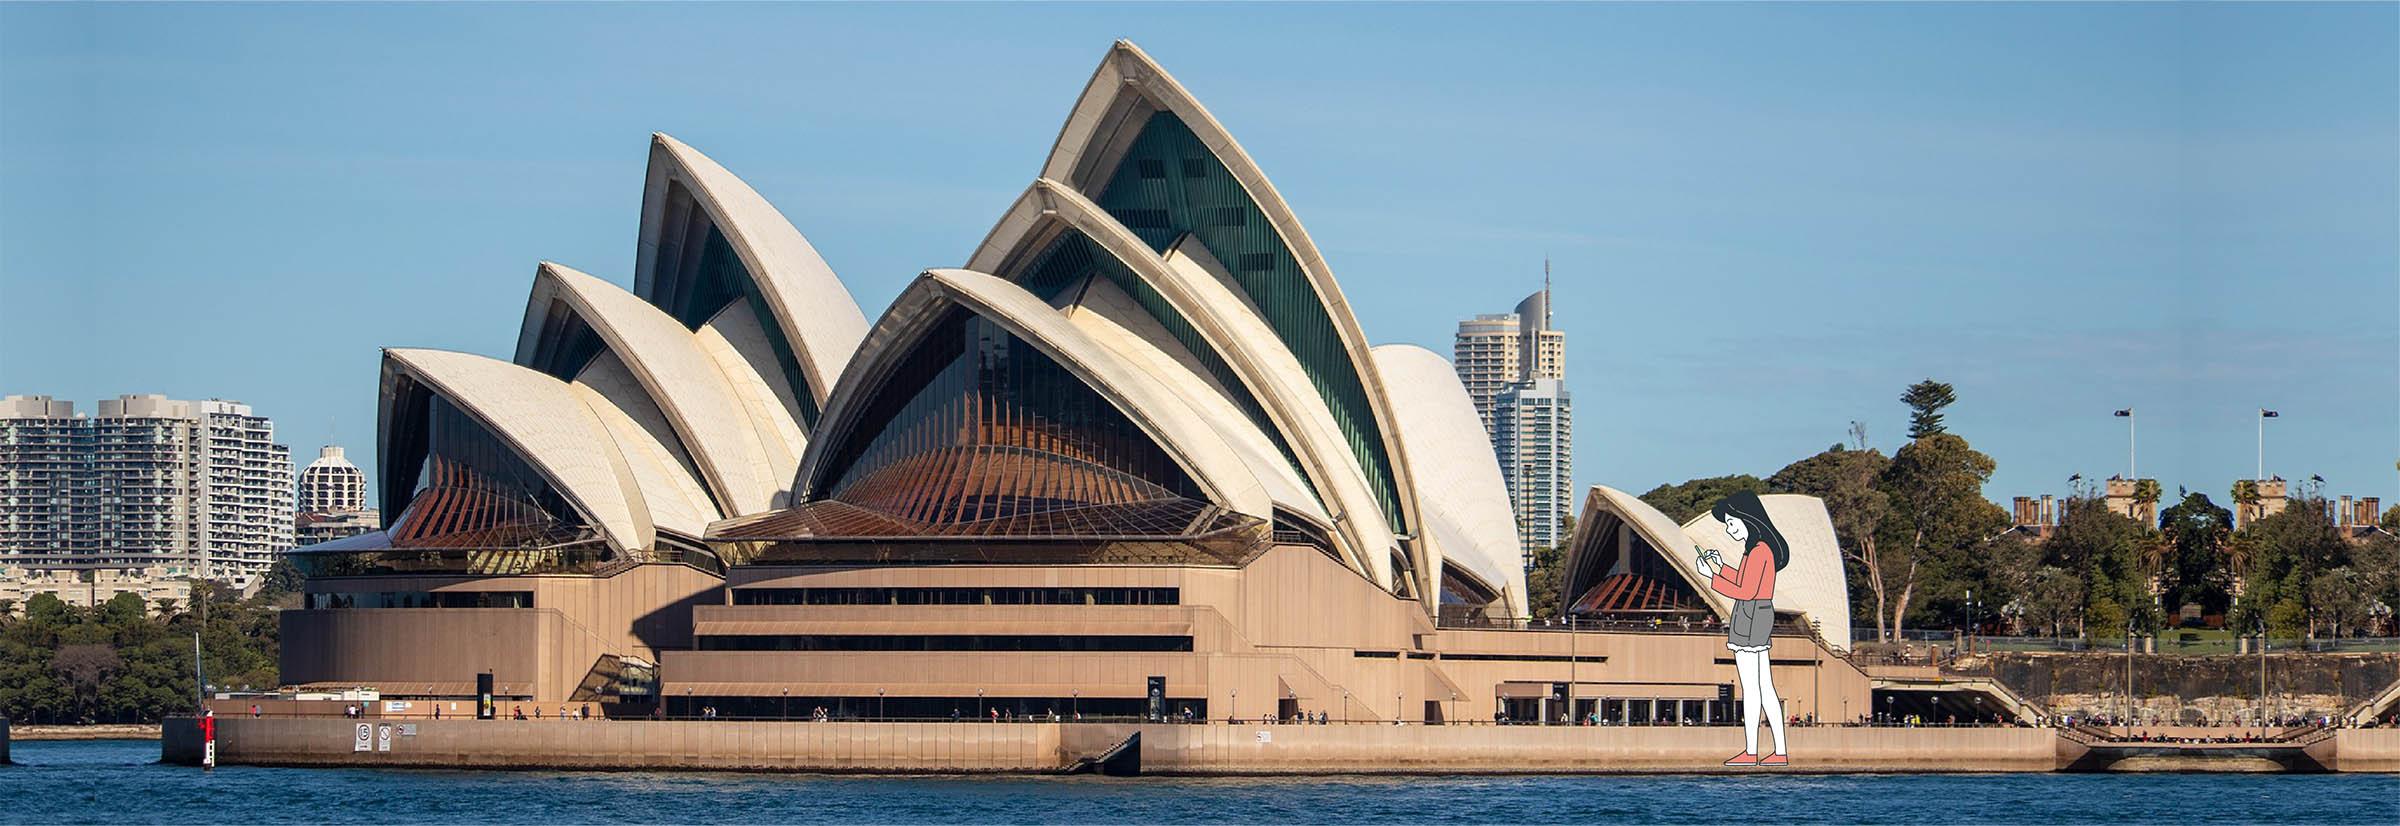 Digital nomad en visite devant l'opéra de Sydney